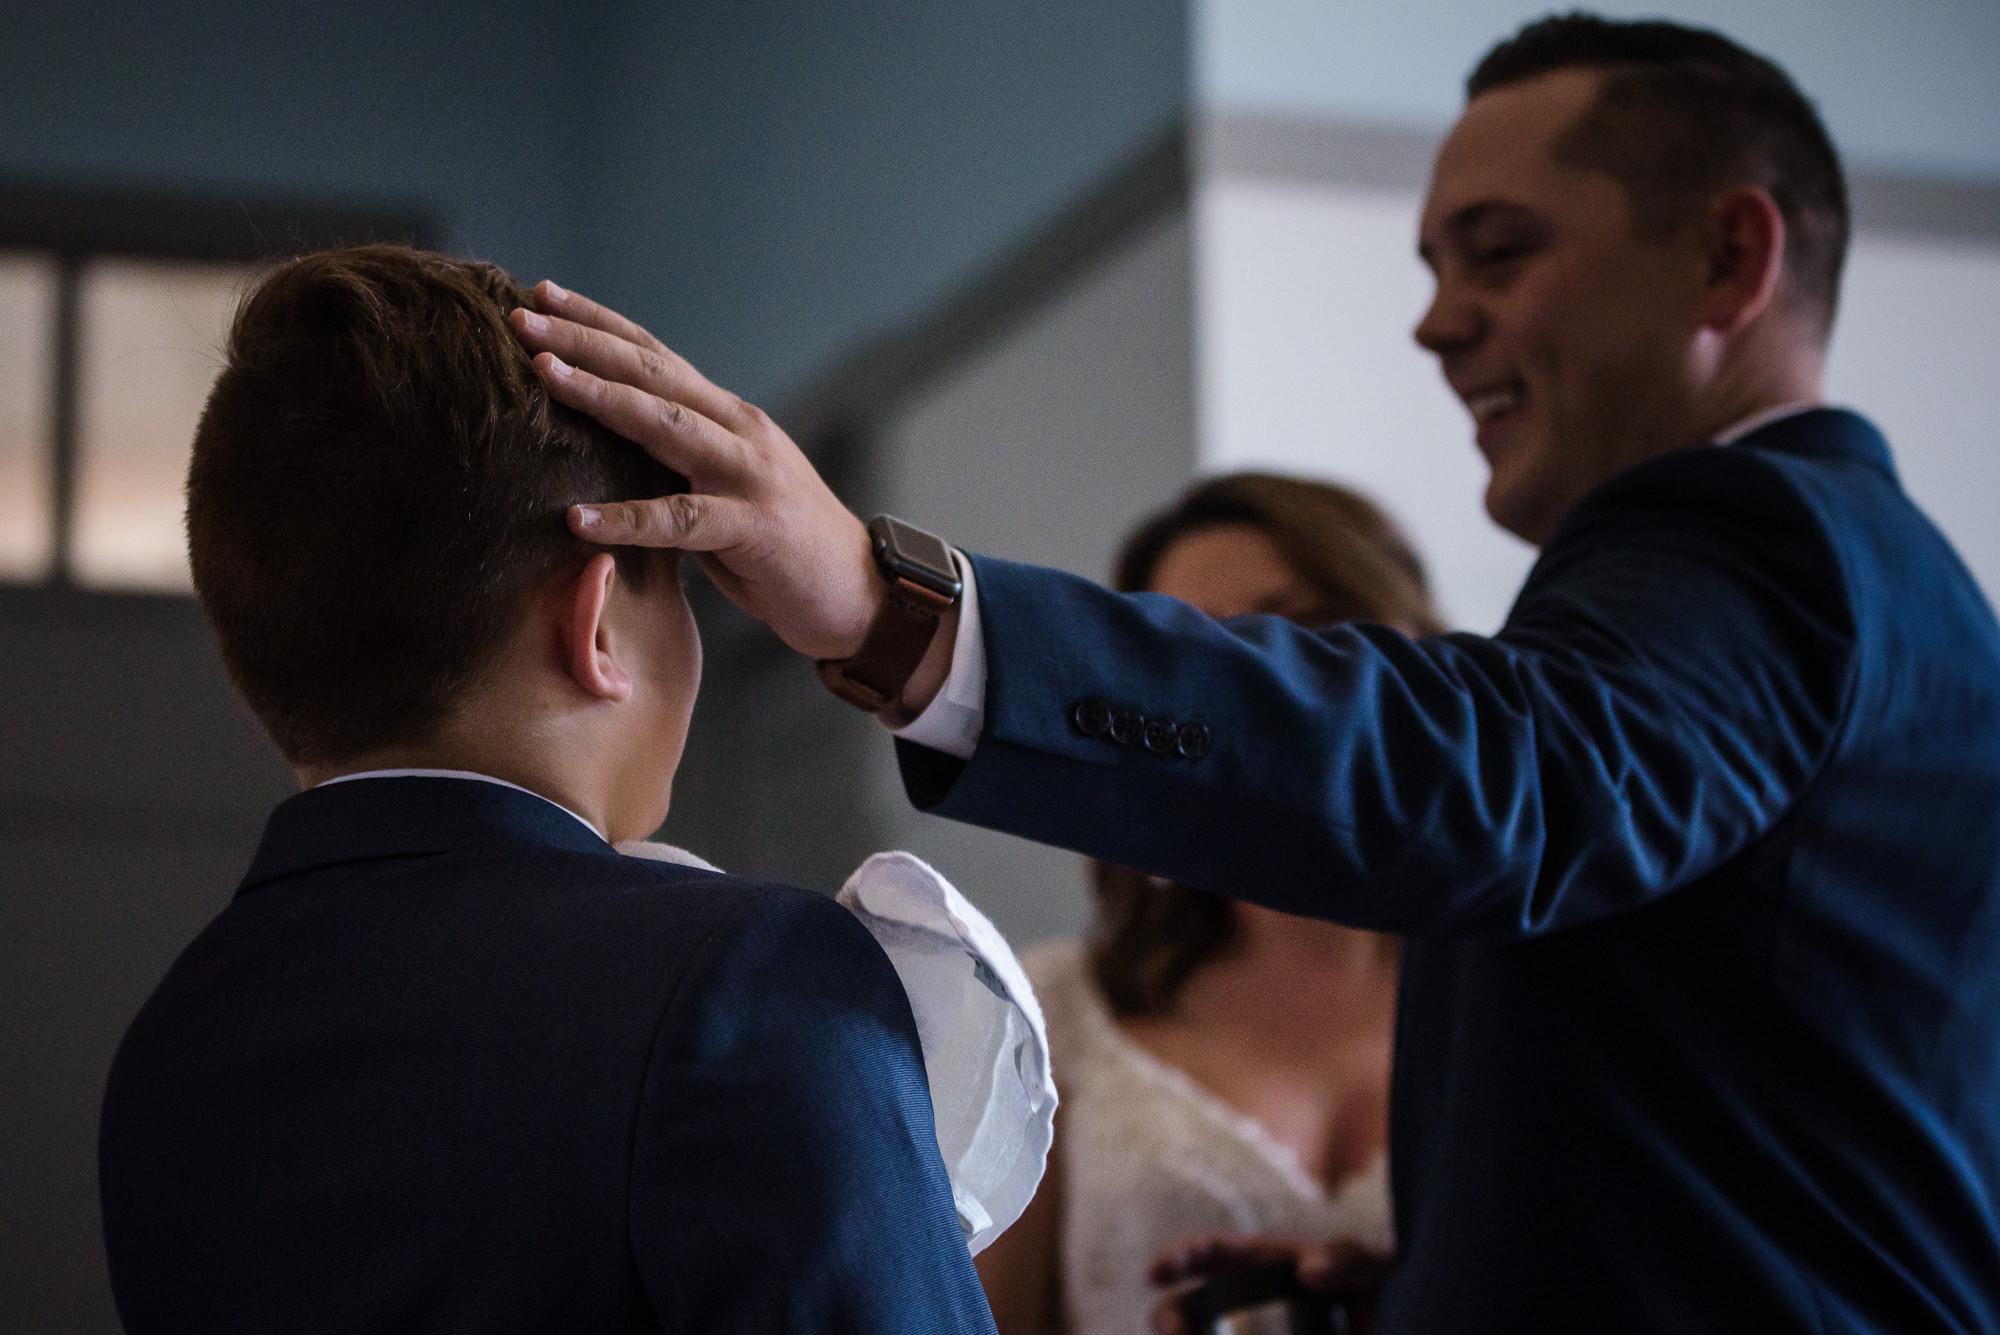 KEVIN-STACY-NOAHS-EVENT-VENUE-OMAHA-WEDDING-PHOTOGRAPHER-011.jpg